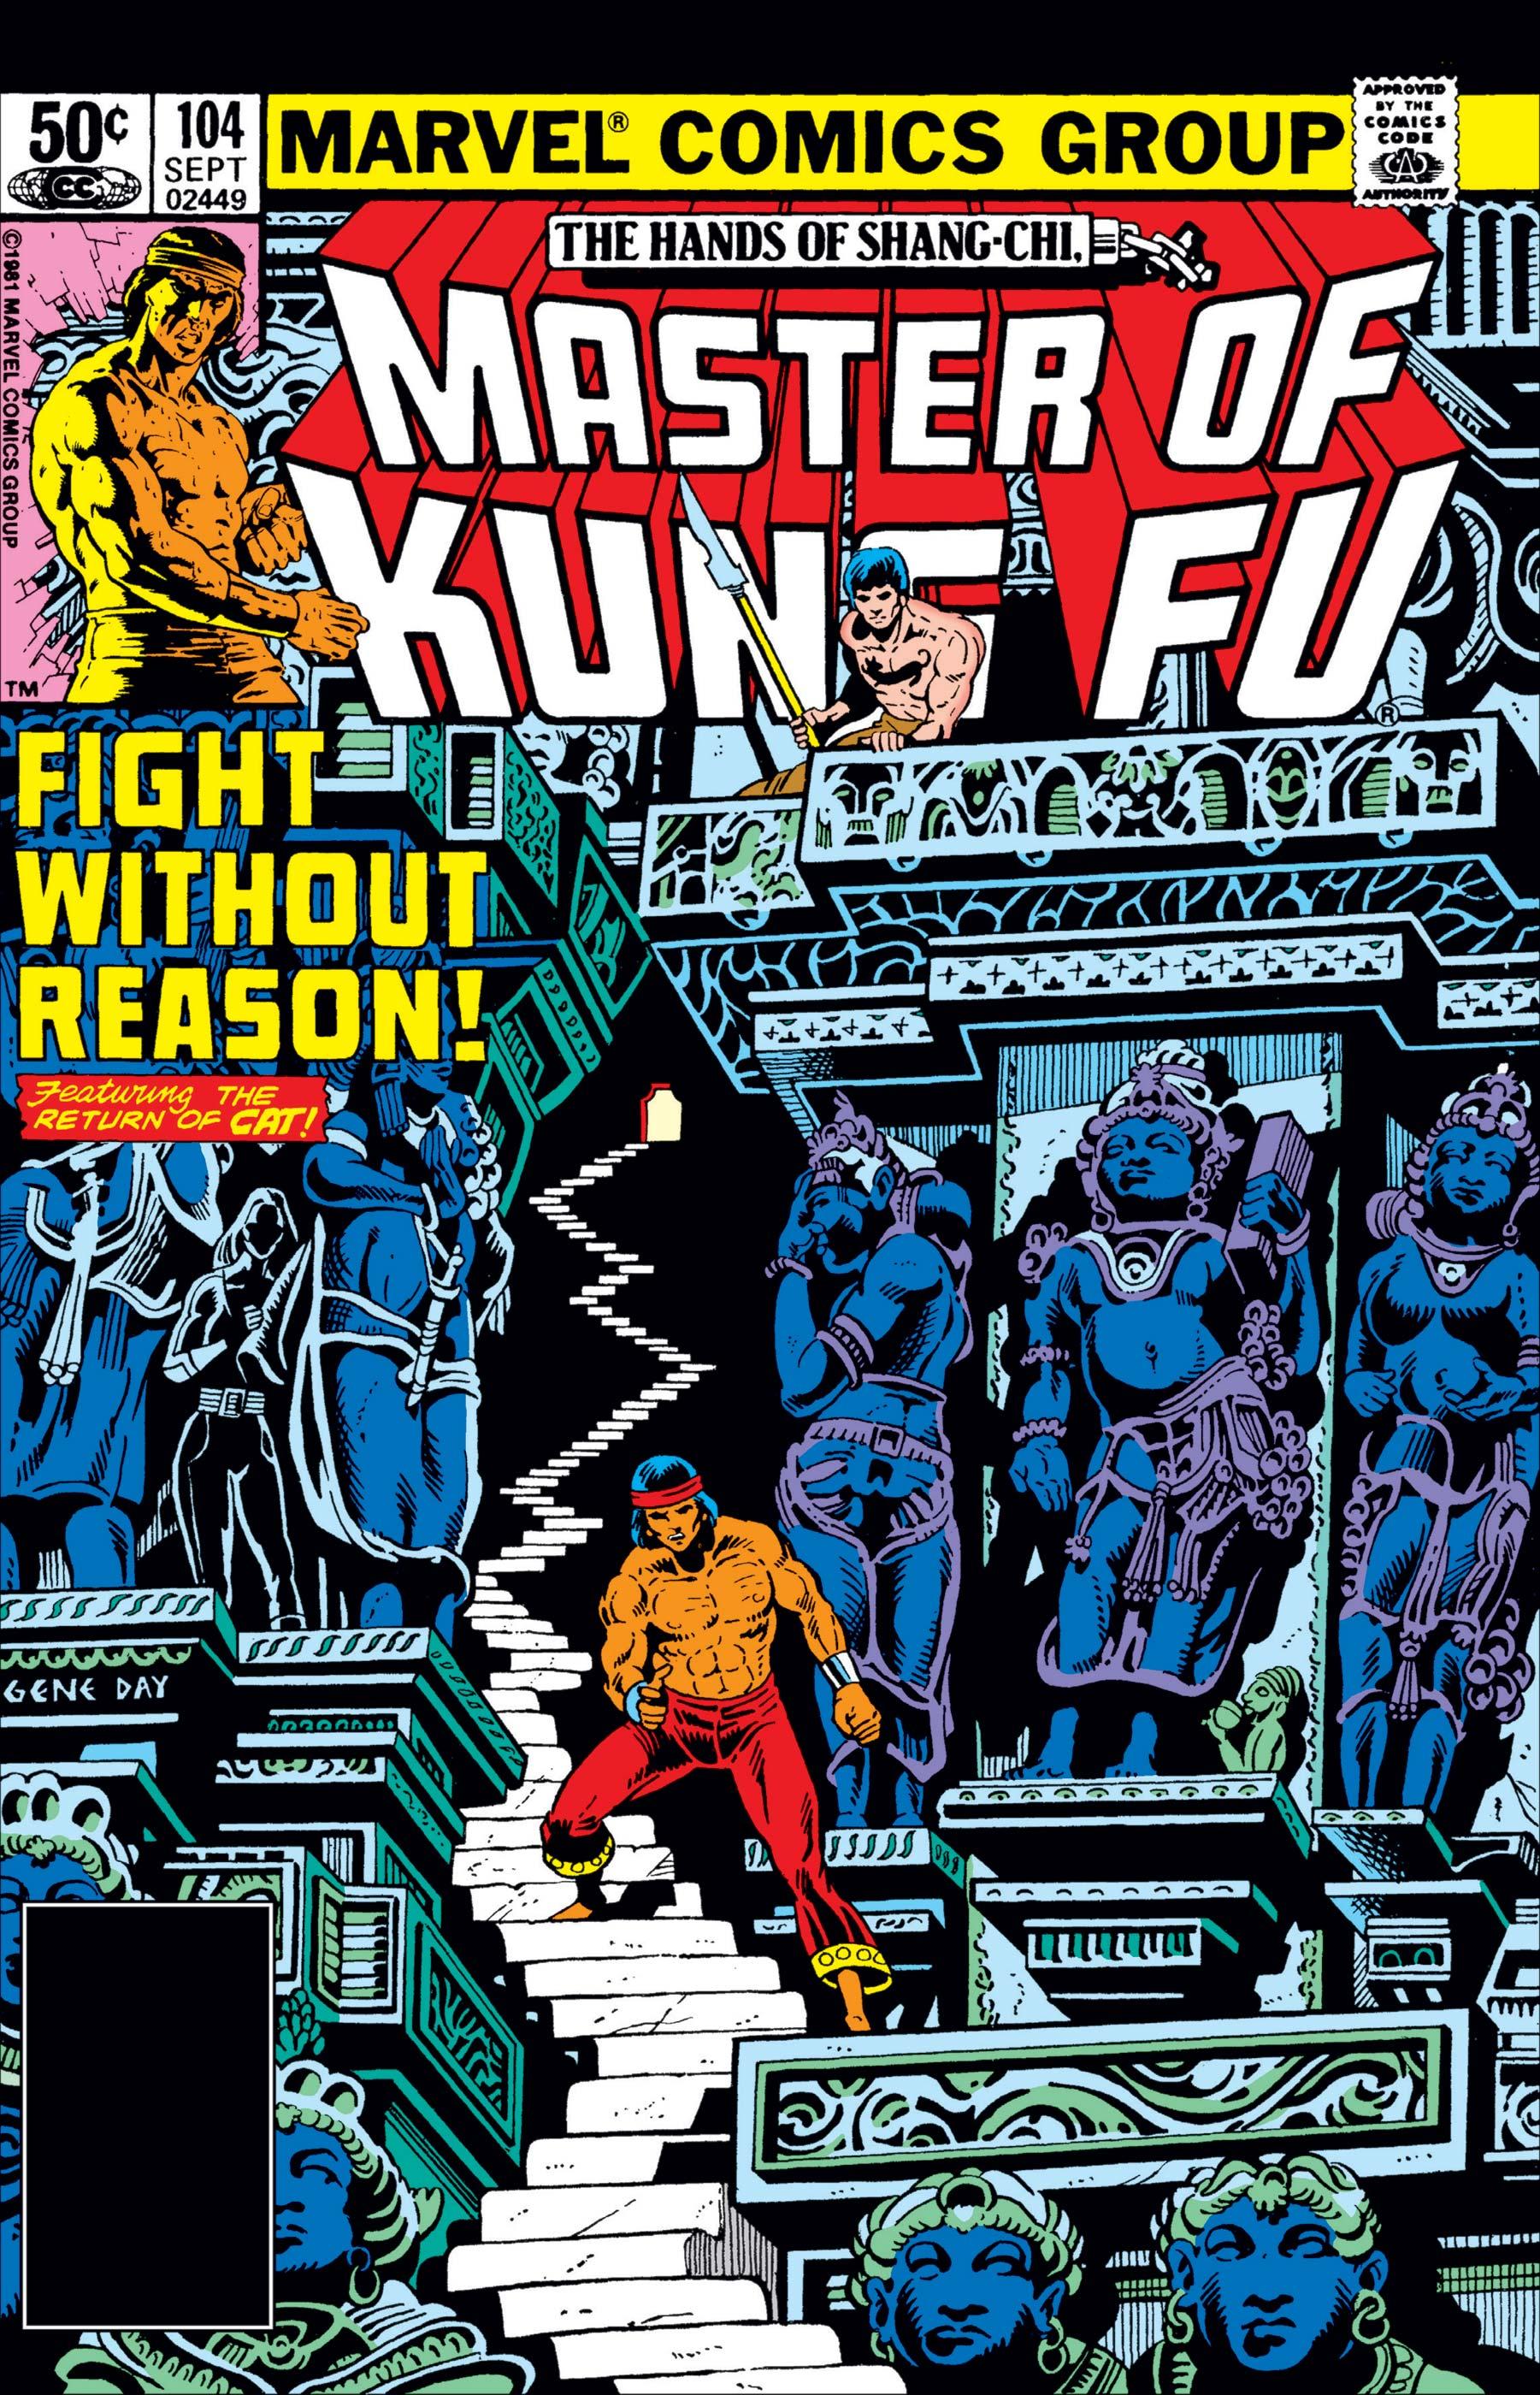 Master of Kung Fu (1974) #104